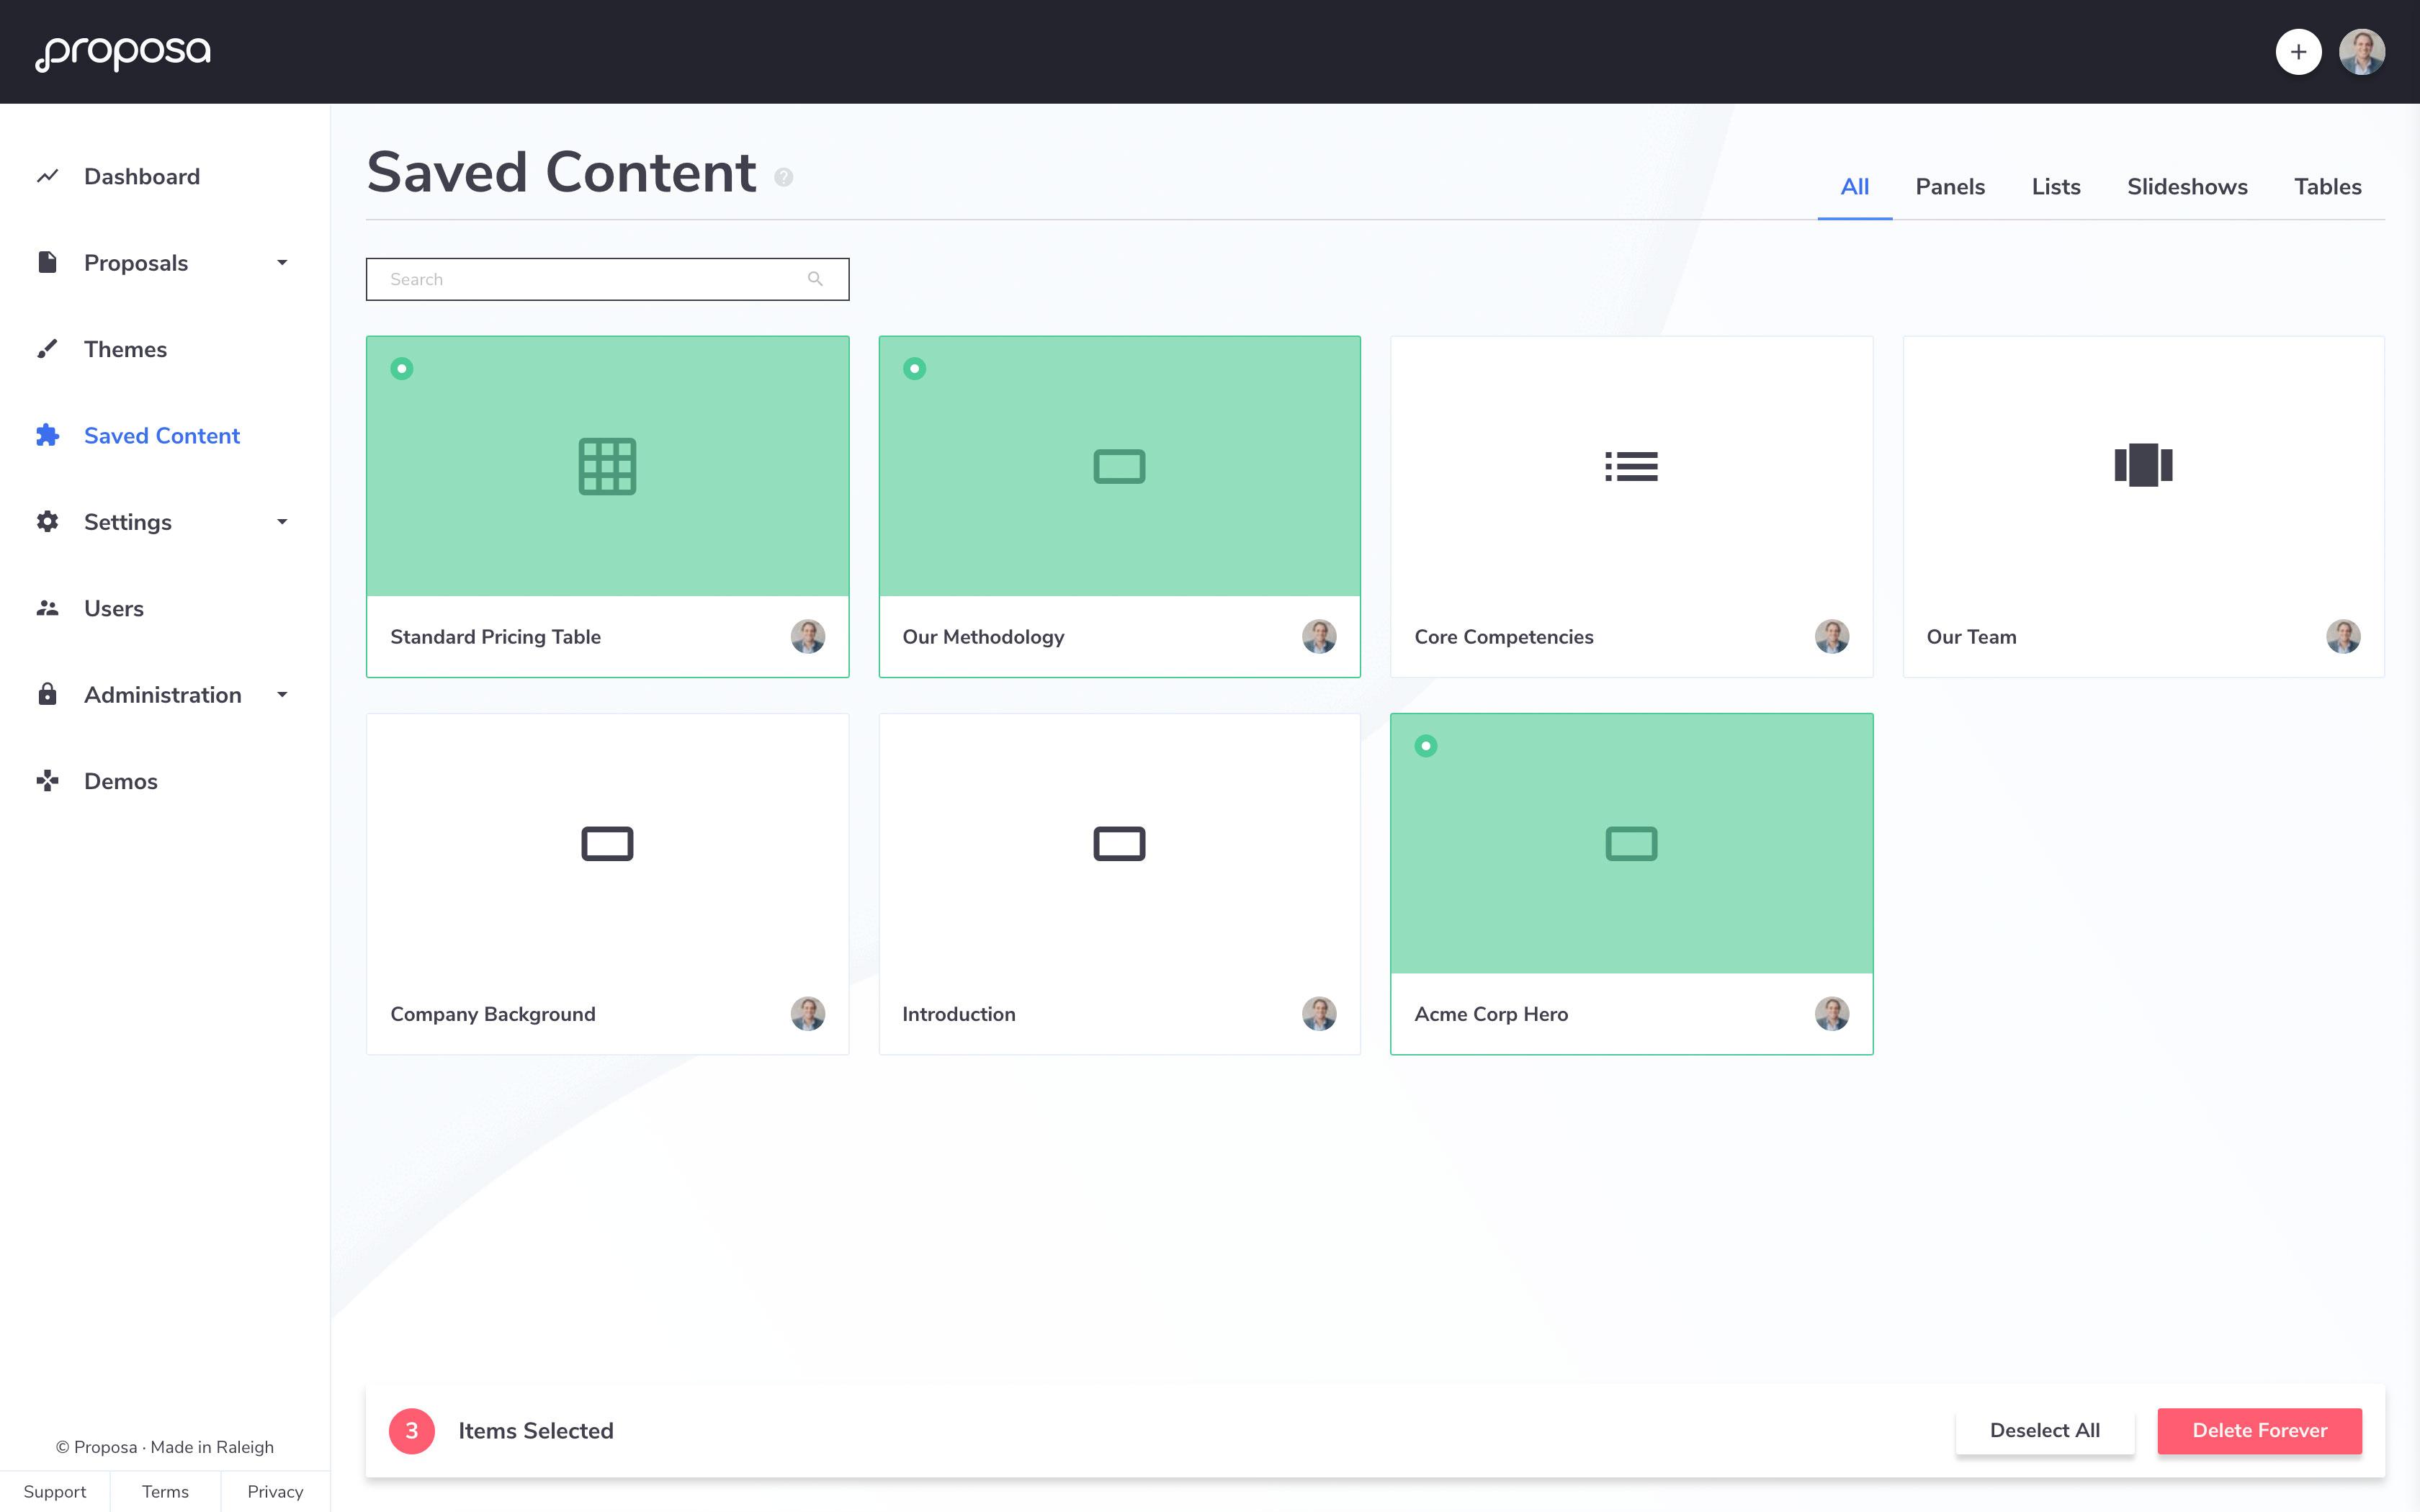 saved_content_3.jpg